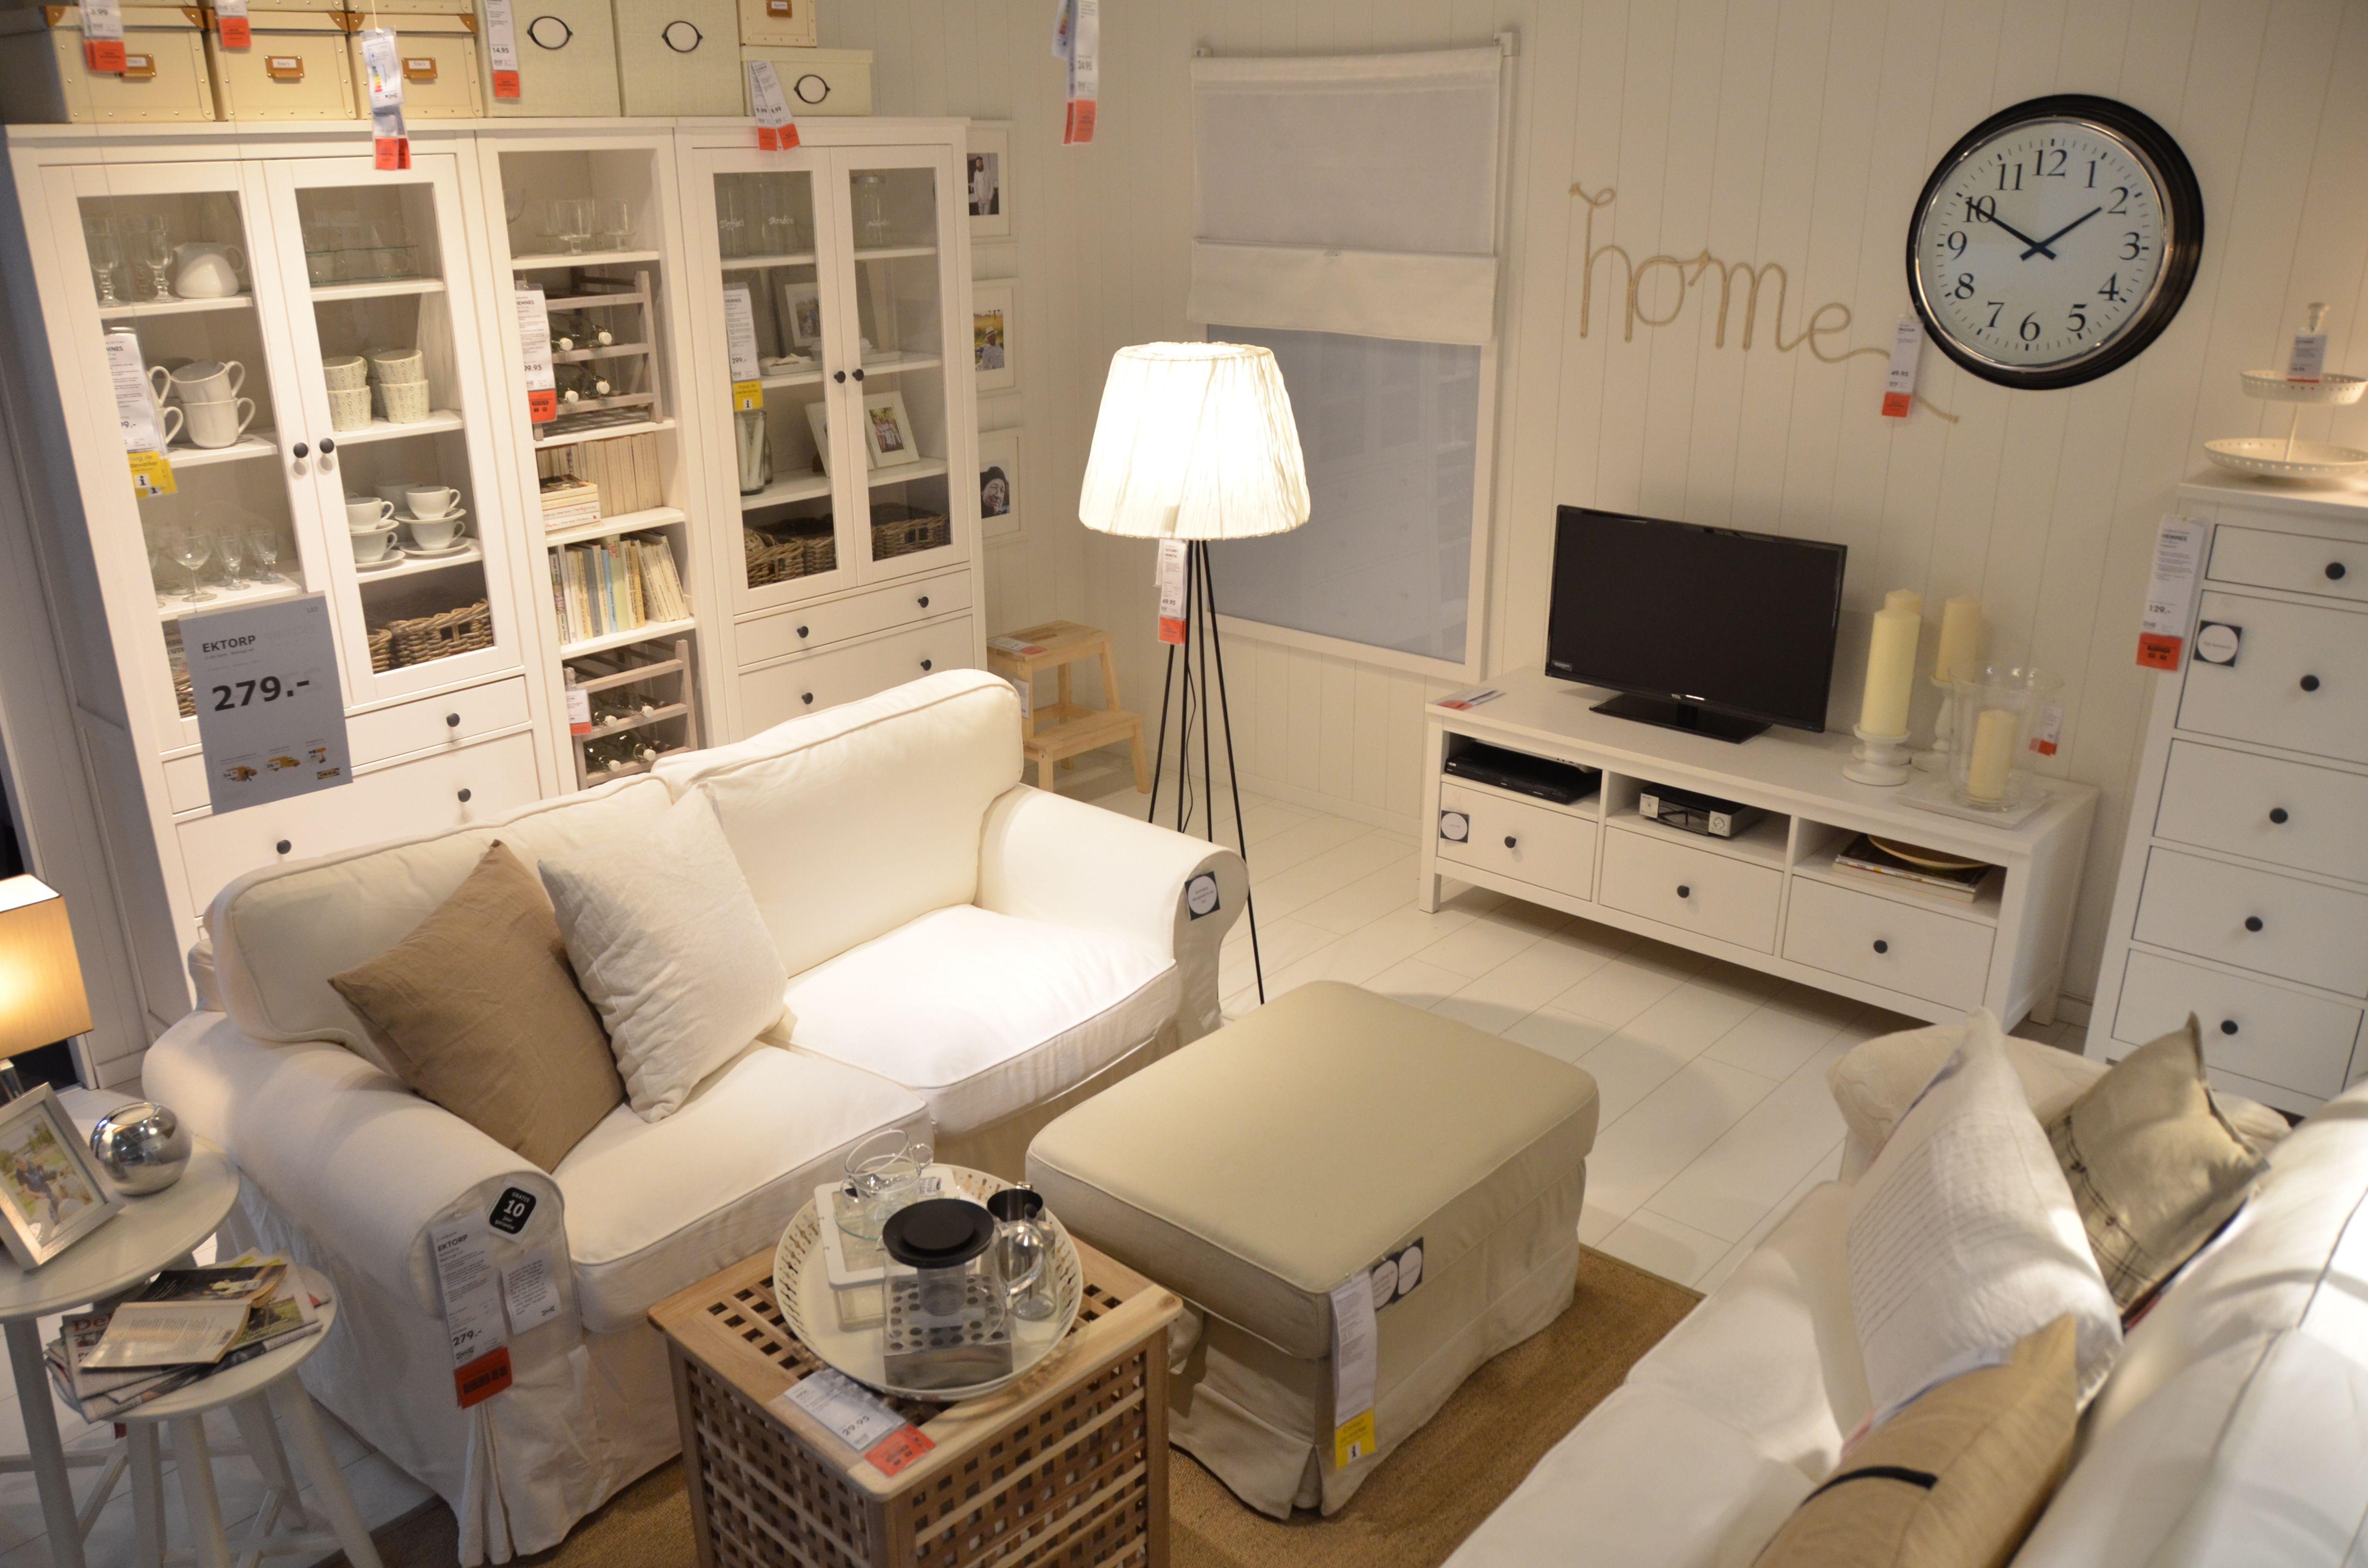 wwwikea bedroom furniture. IKEA Delft | Living Room EKTORP HEMNES Traditional White Interior Www Wwwikea Bedroom Furniture